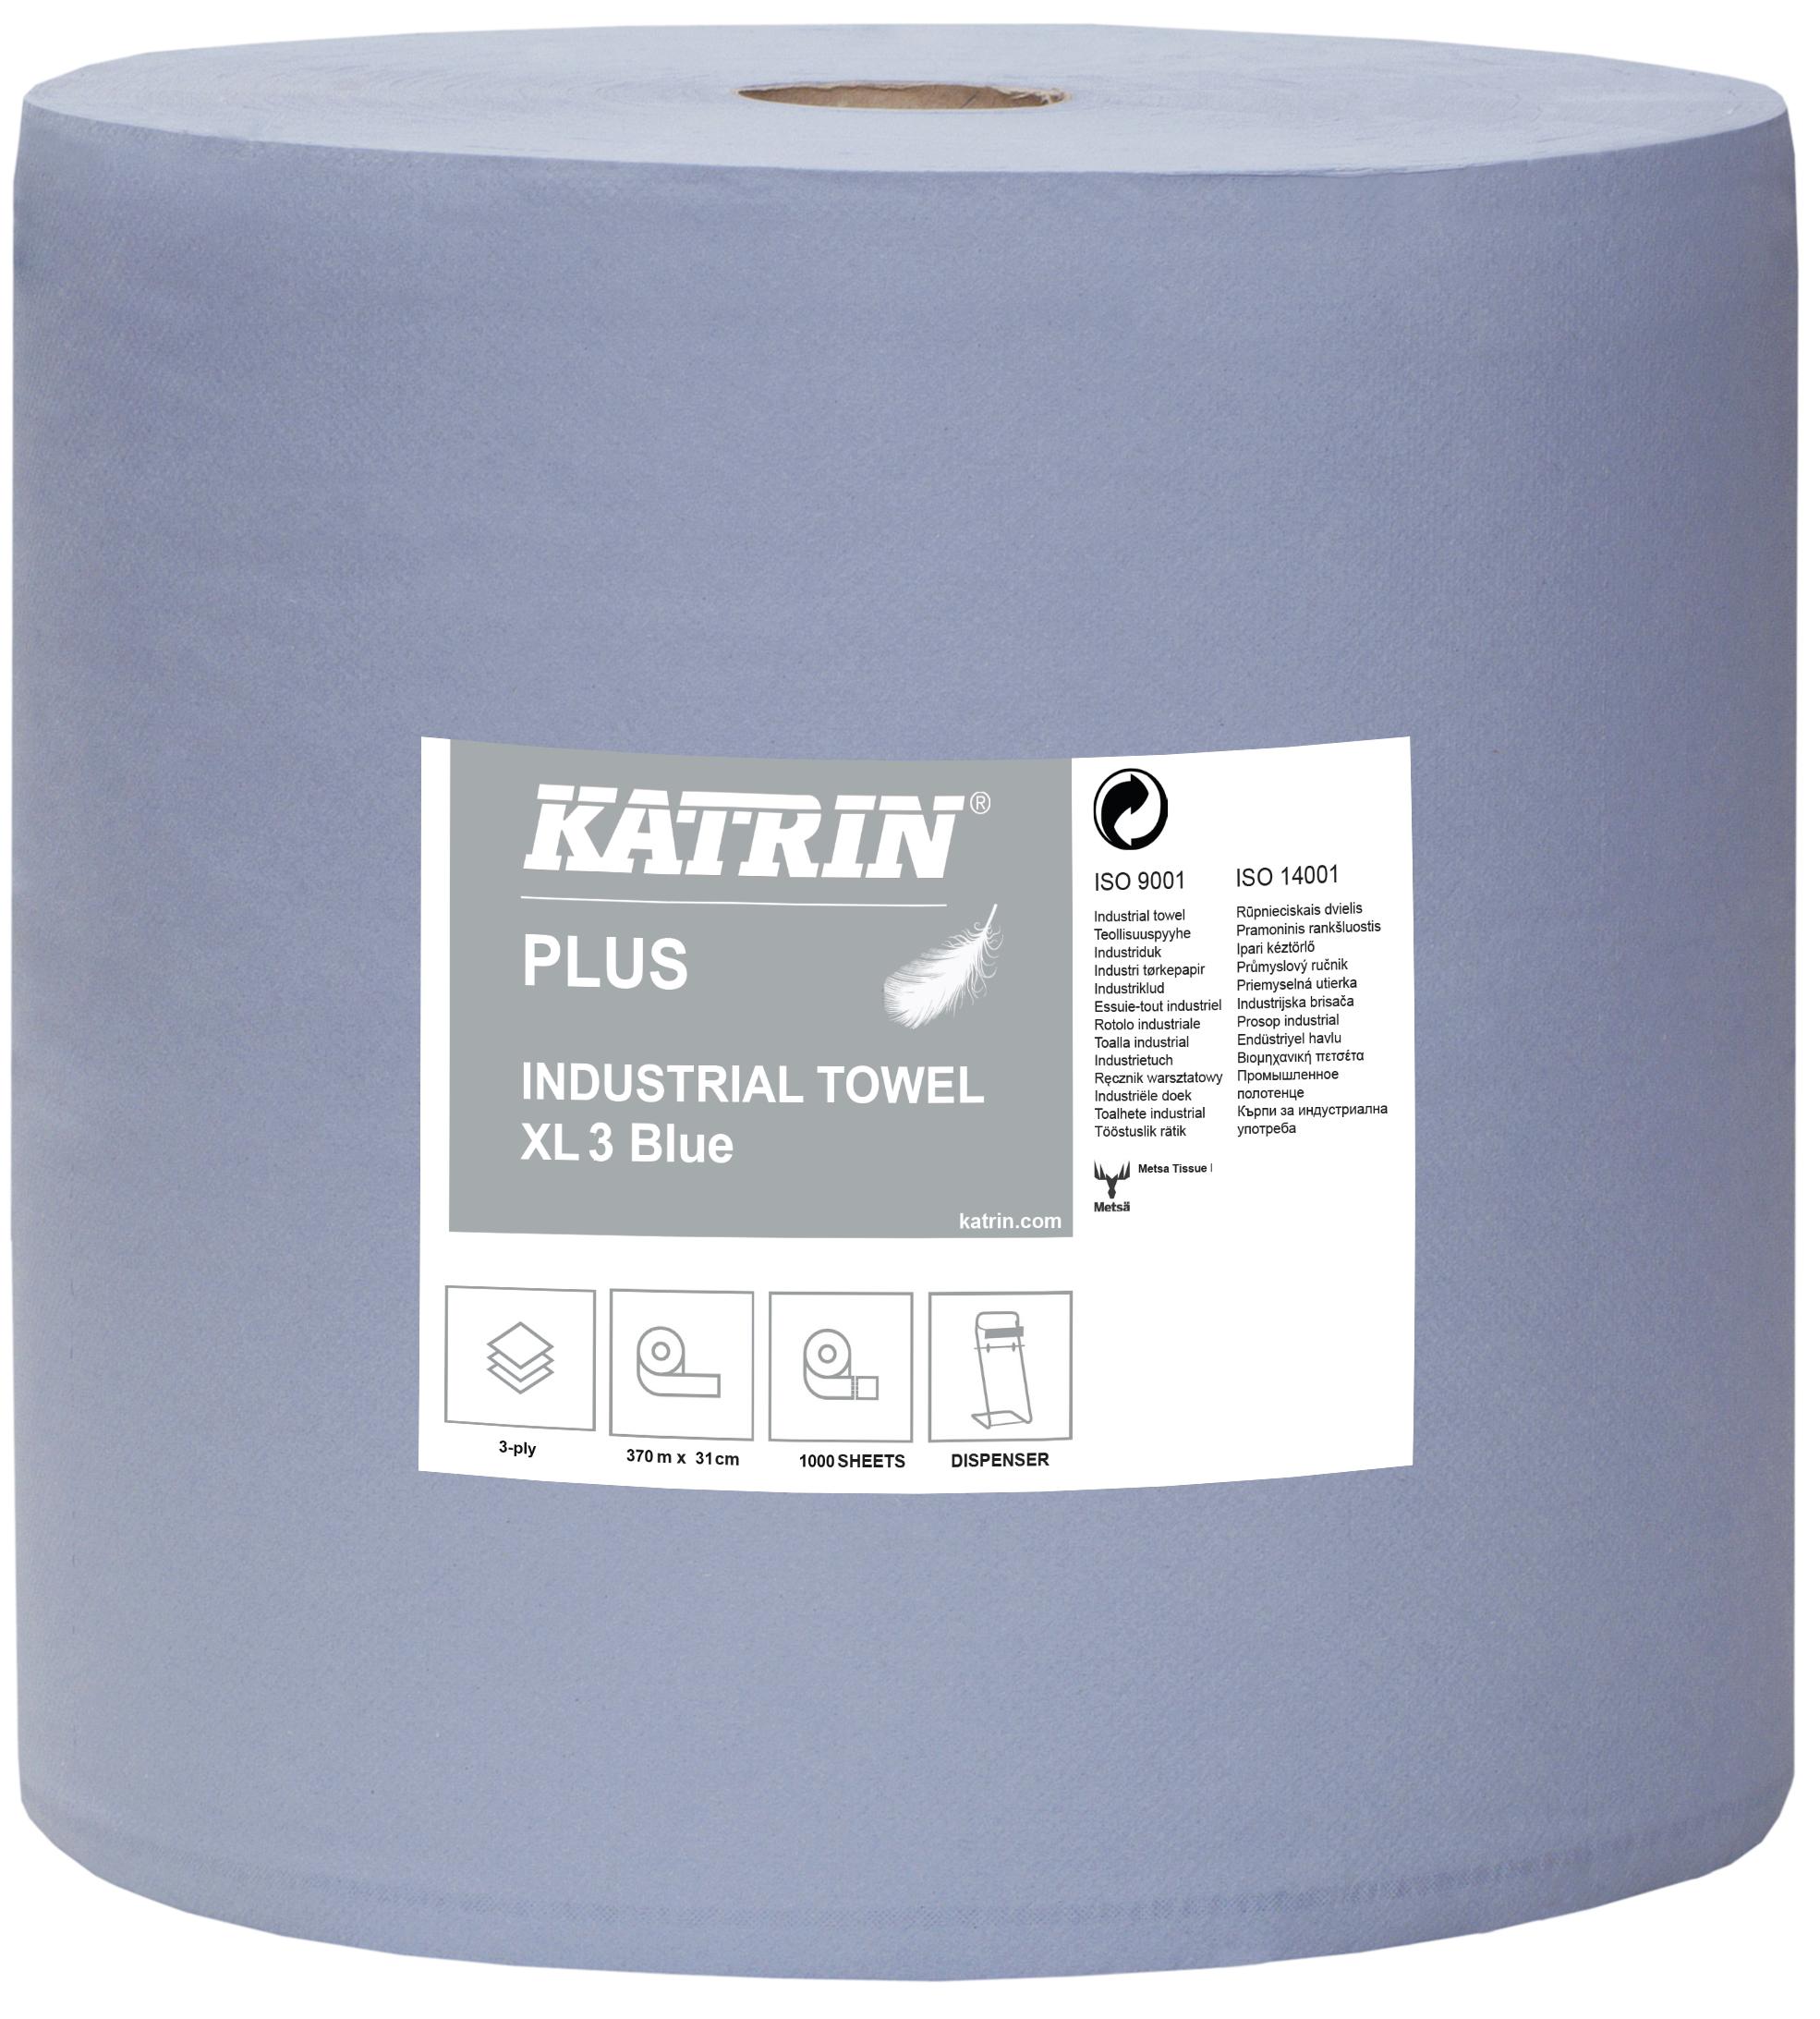 Katrin Plus Industrial Towel XL3 Blue